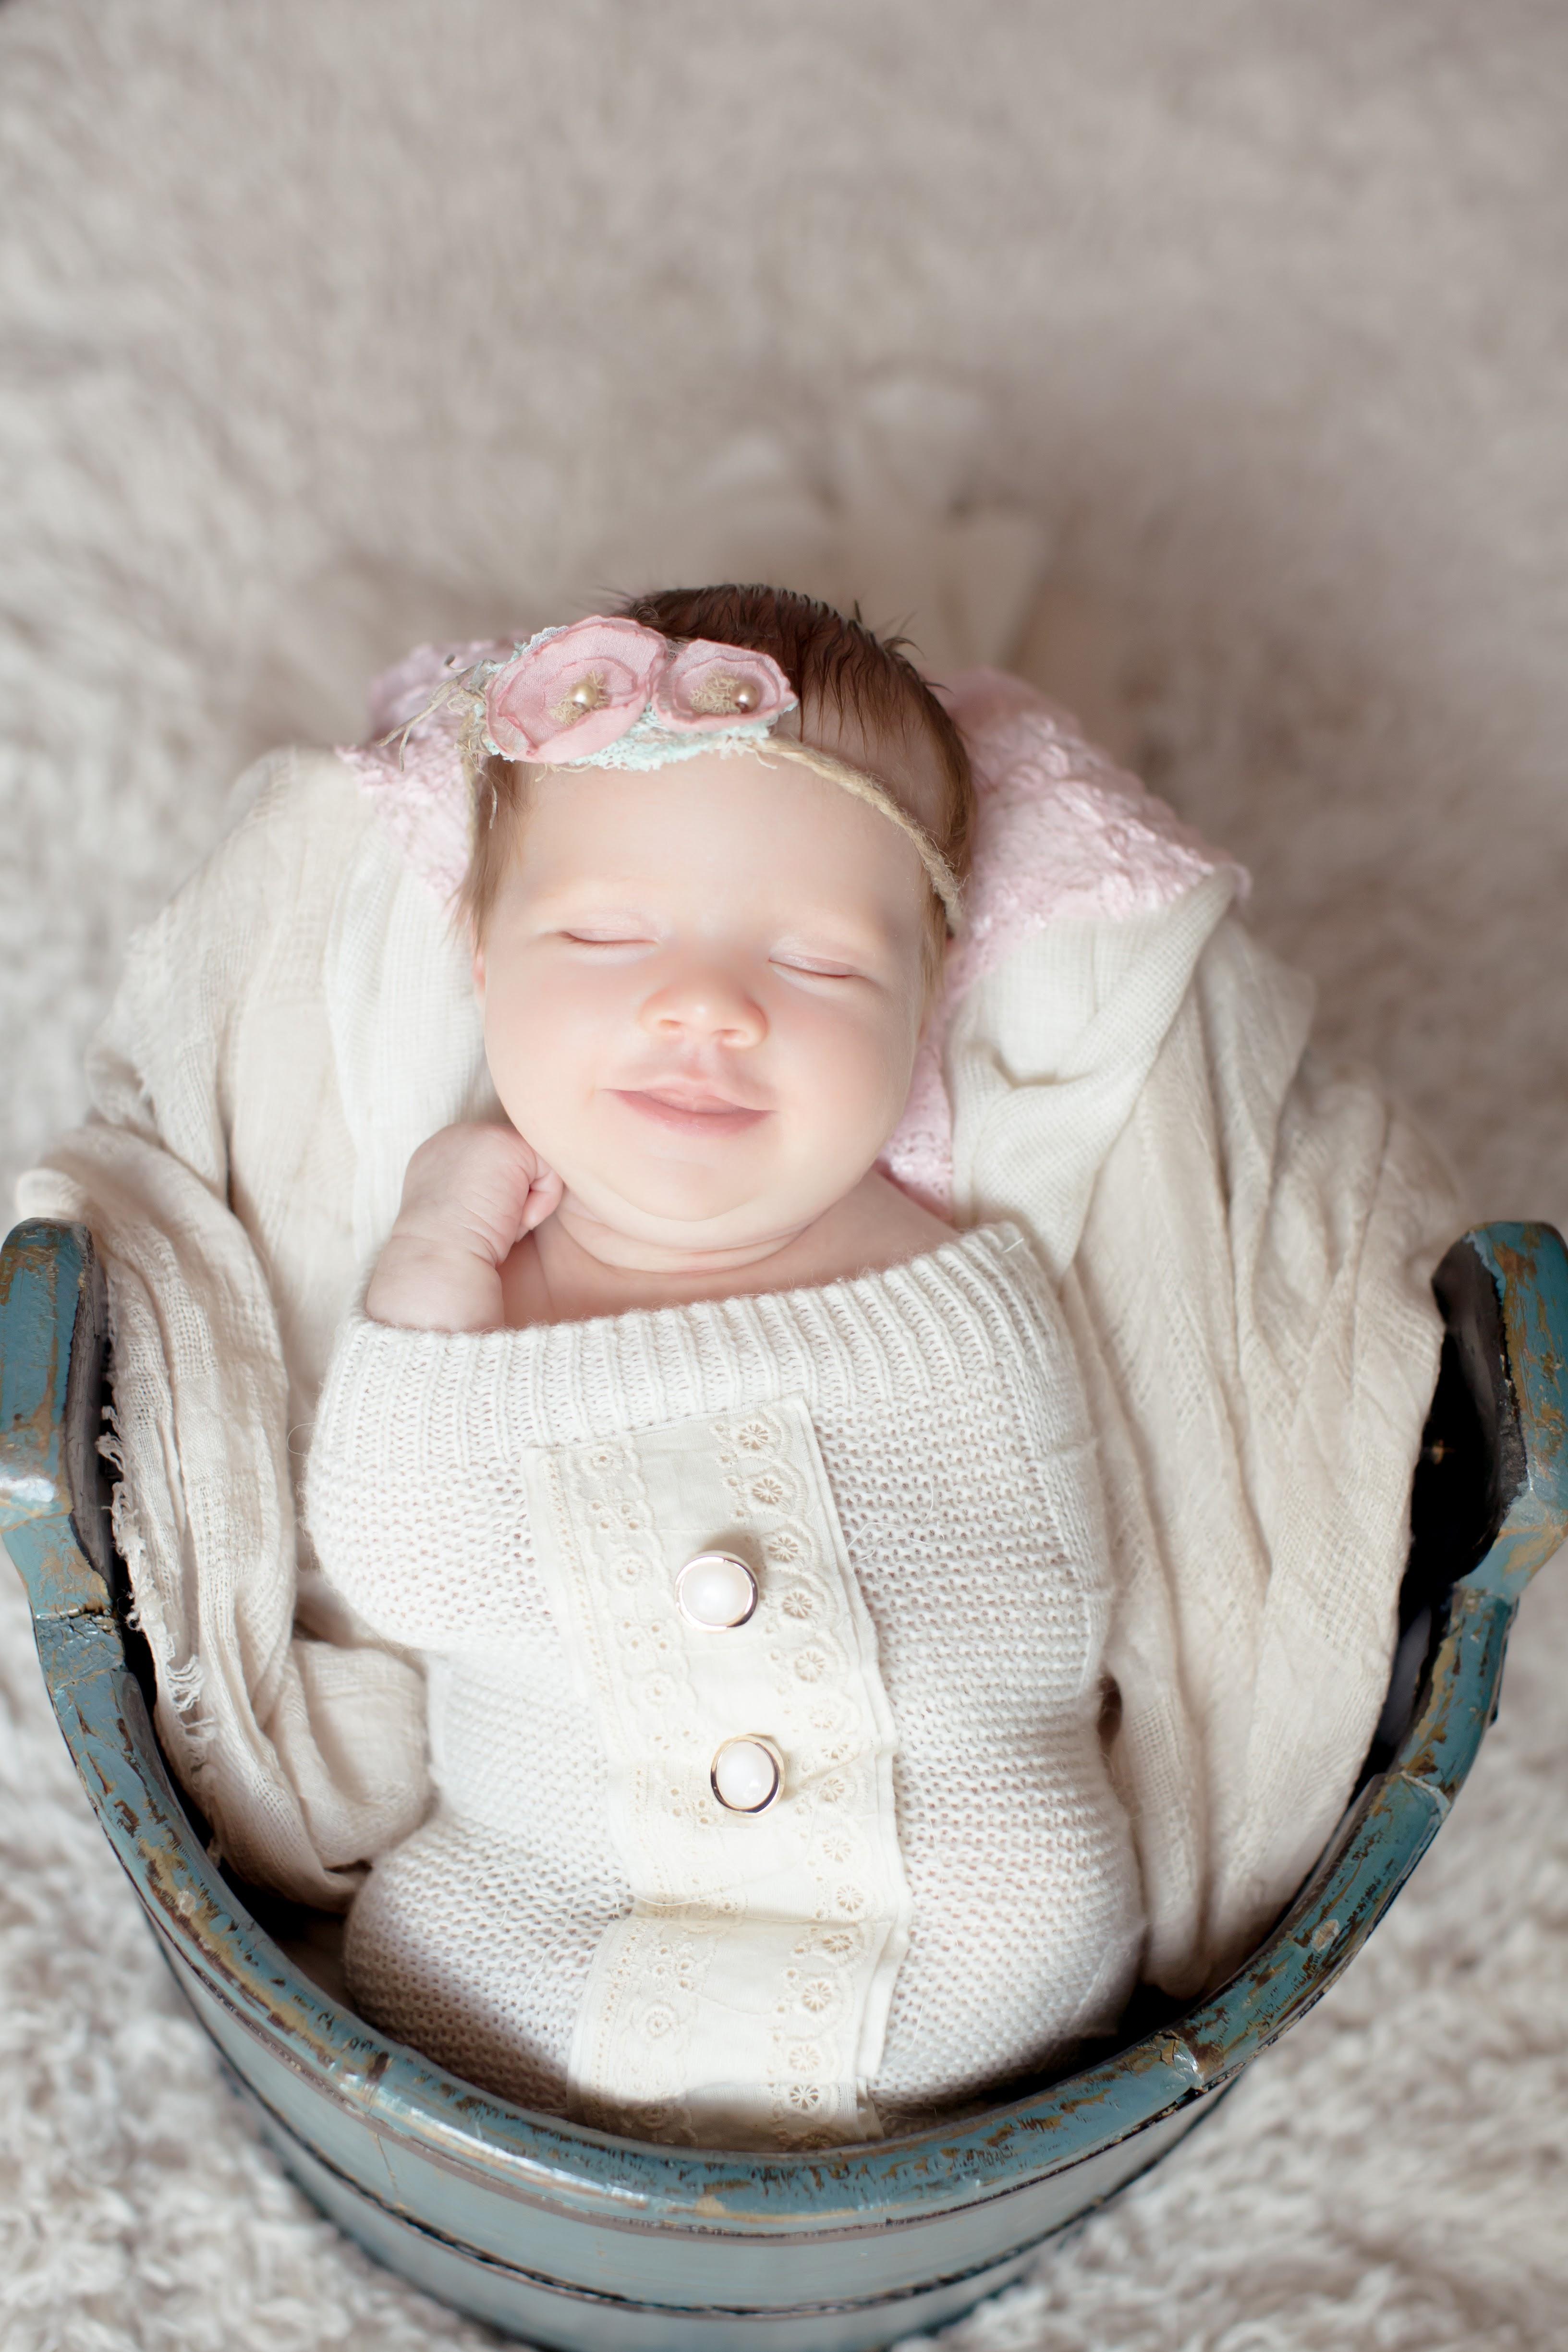 Newborn baby picture